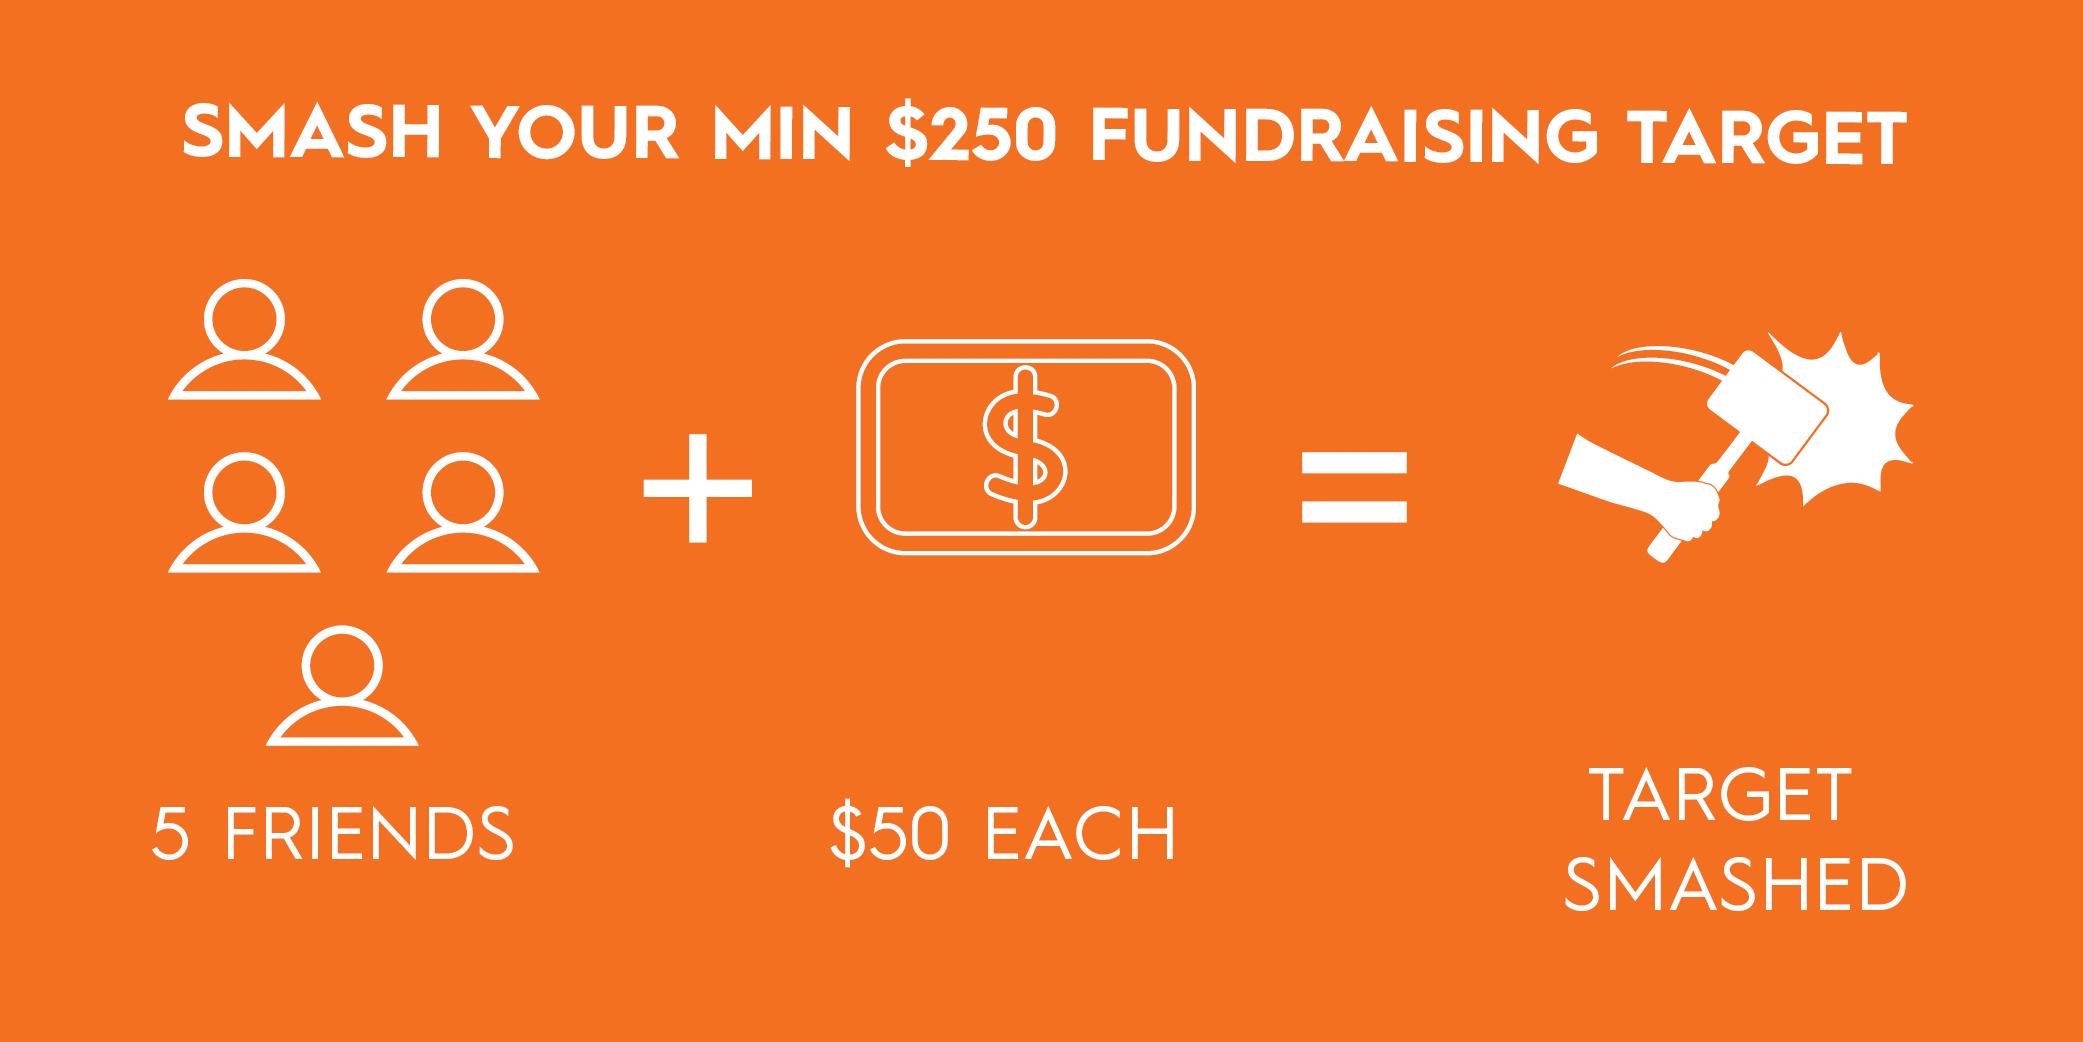 Fundraising Smash